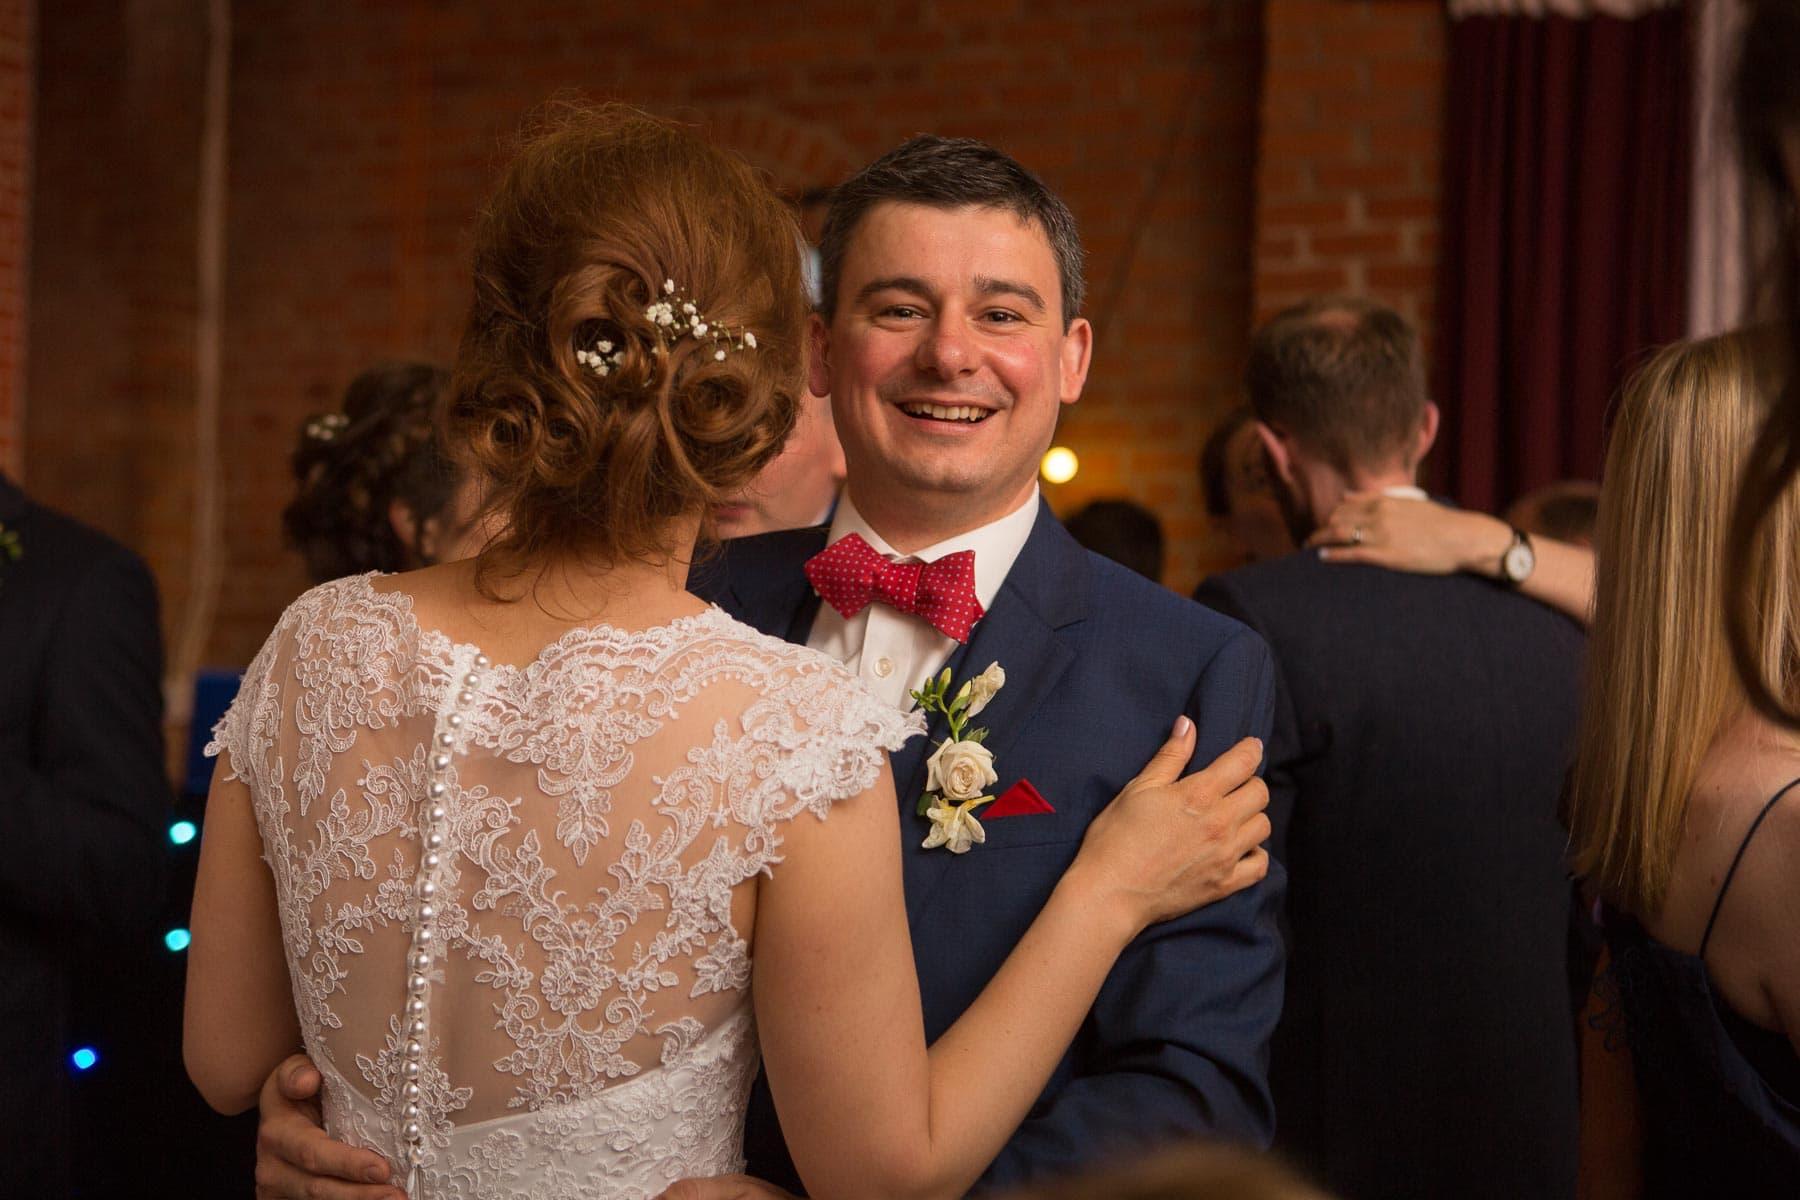 Groom smiles as he holds his bride on the dancefloor